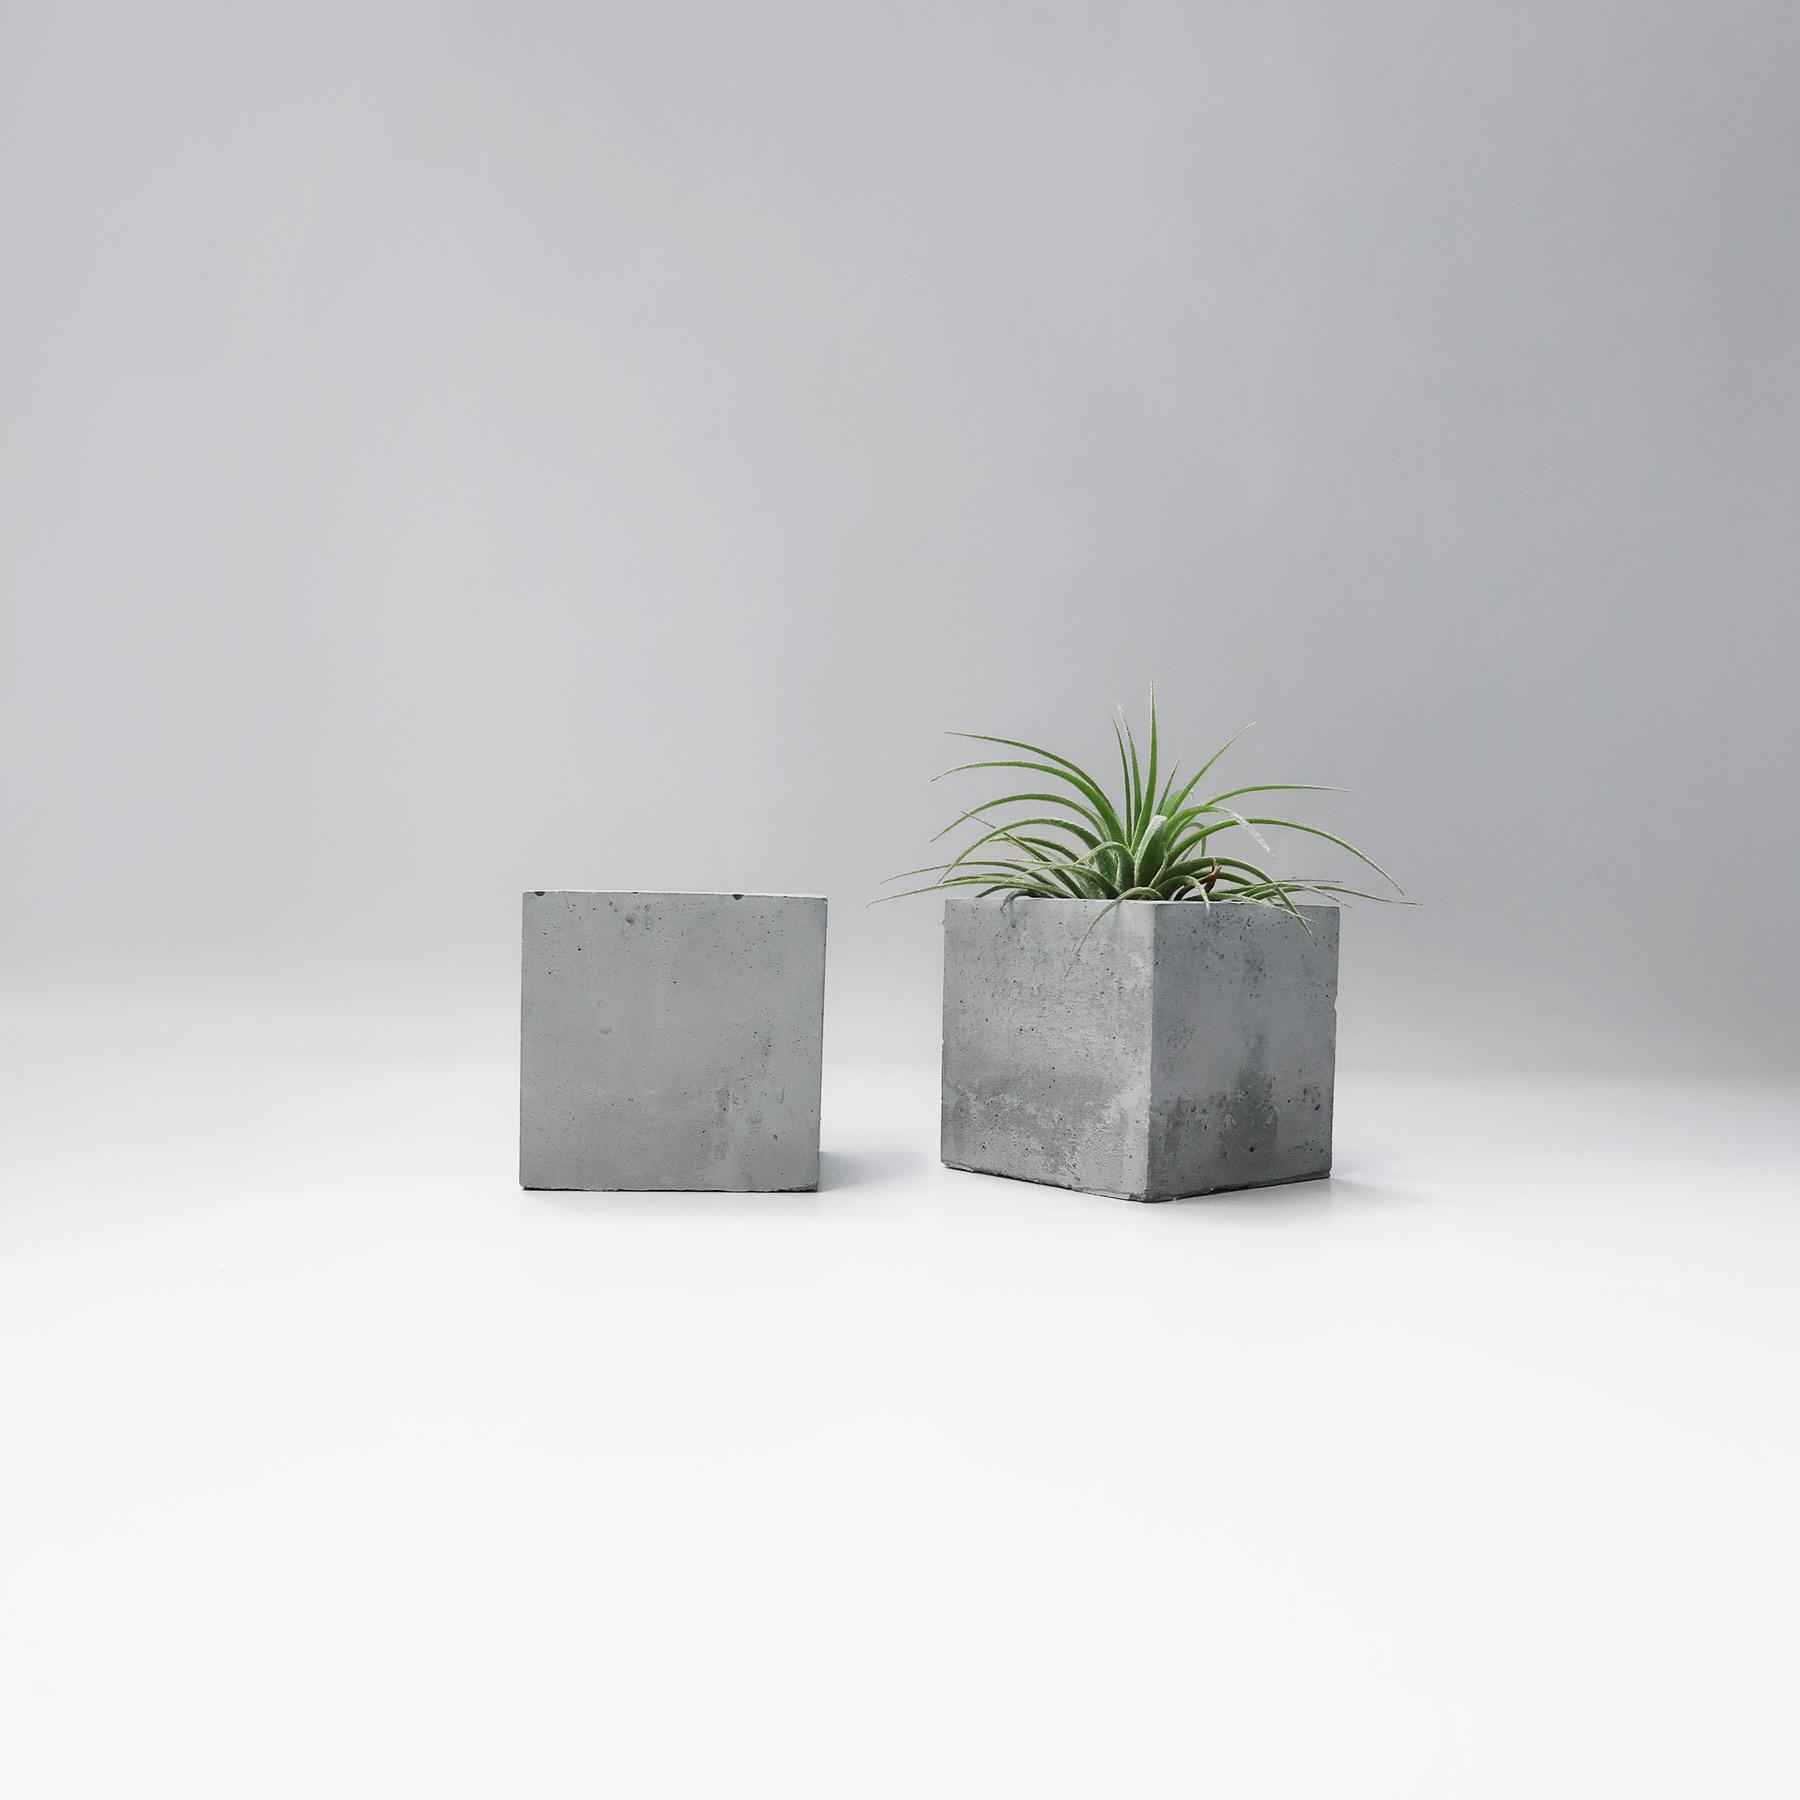 Concrete Design 小方磚水泥蠟燭・飾品收納・空氣鳳梨座